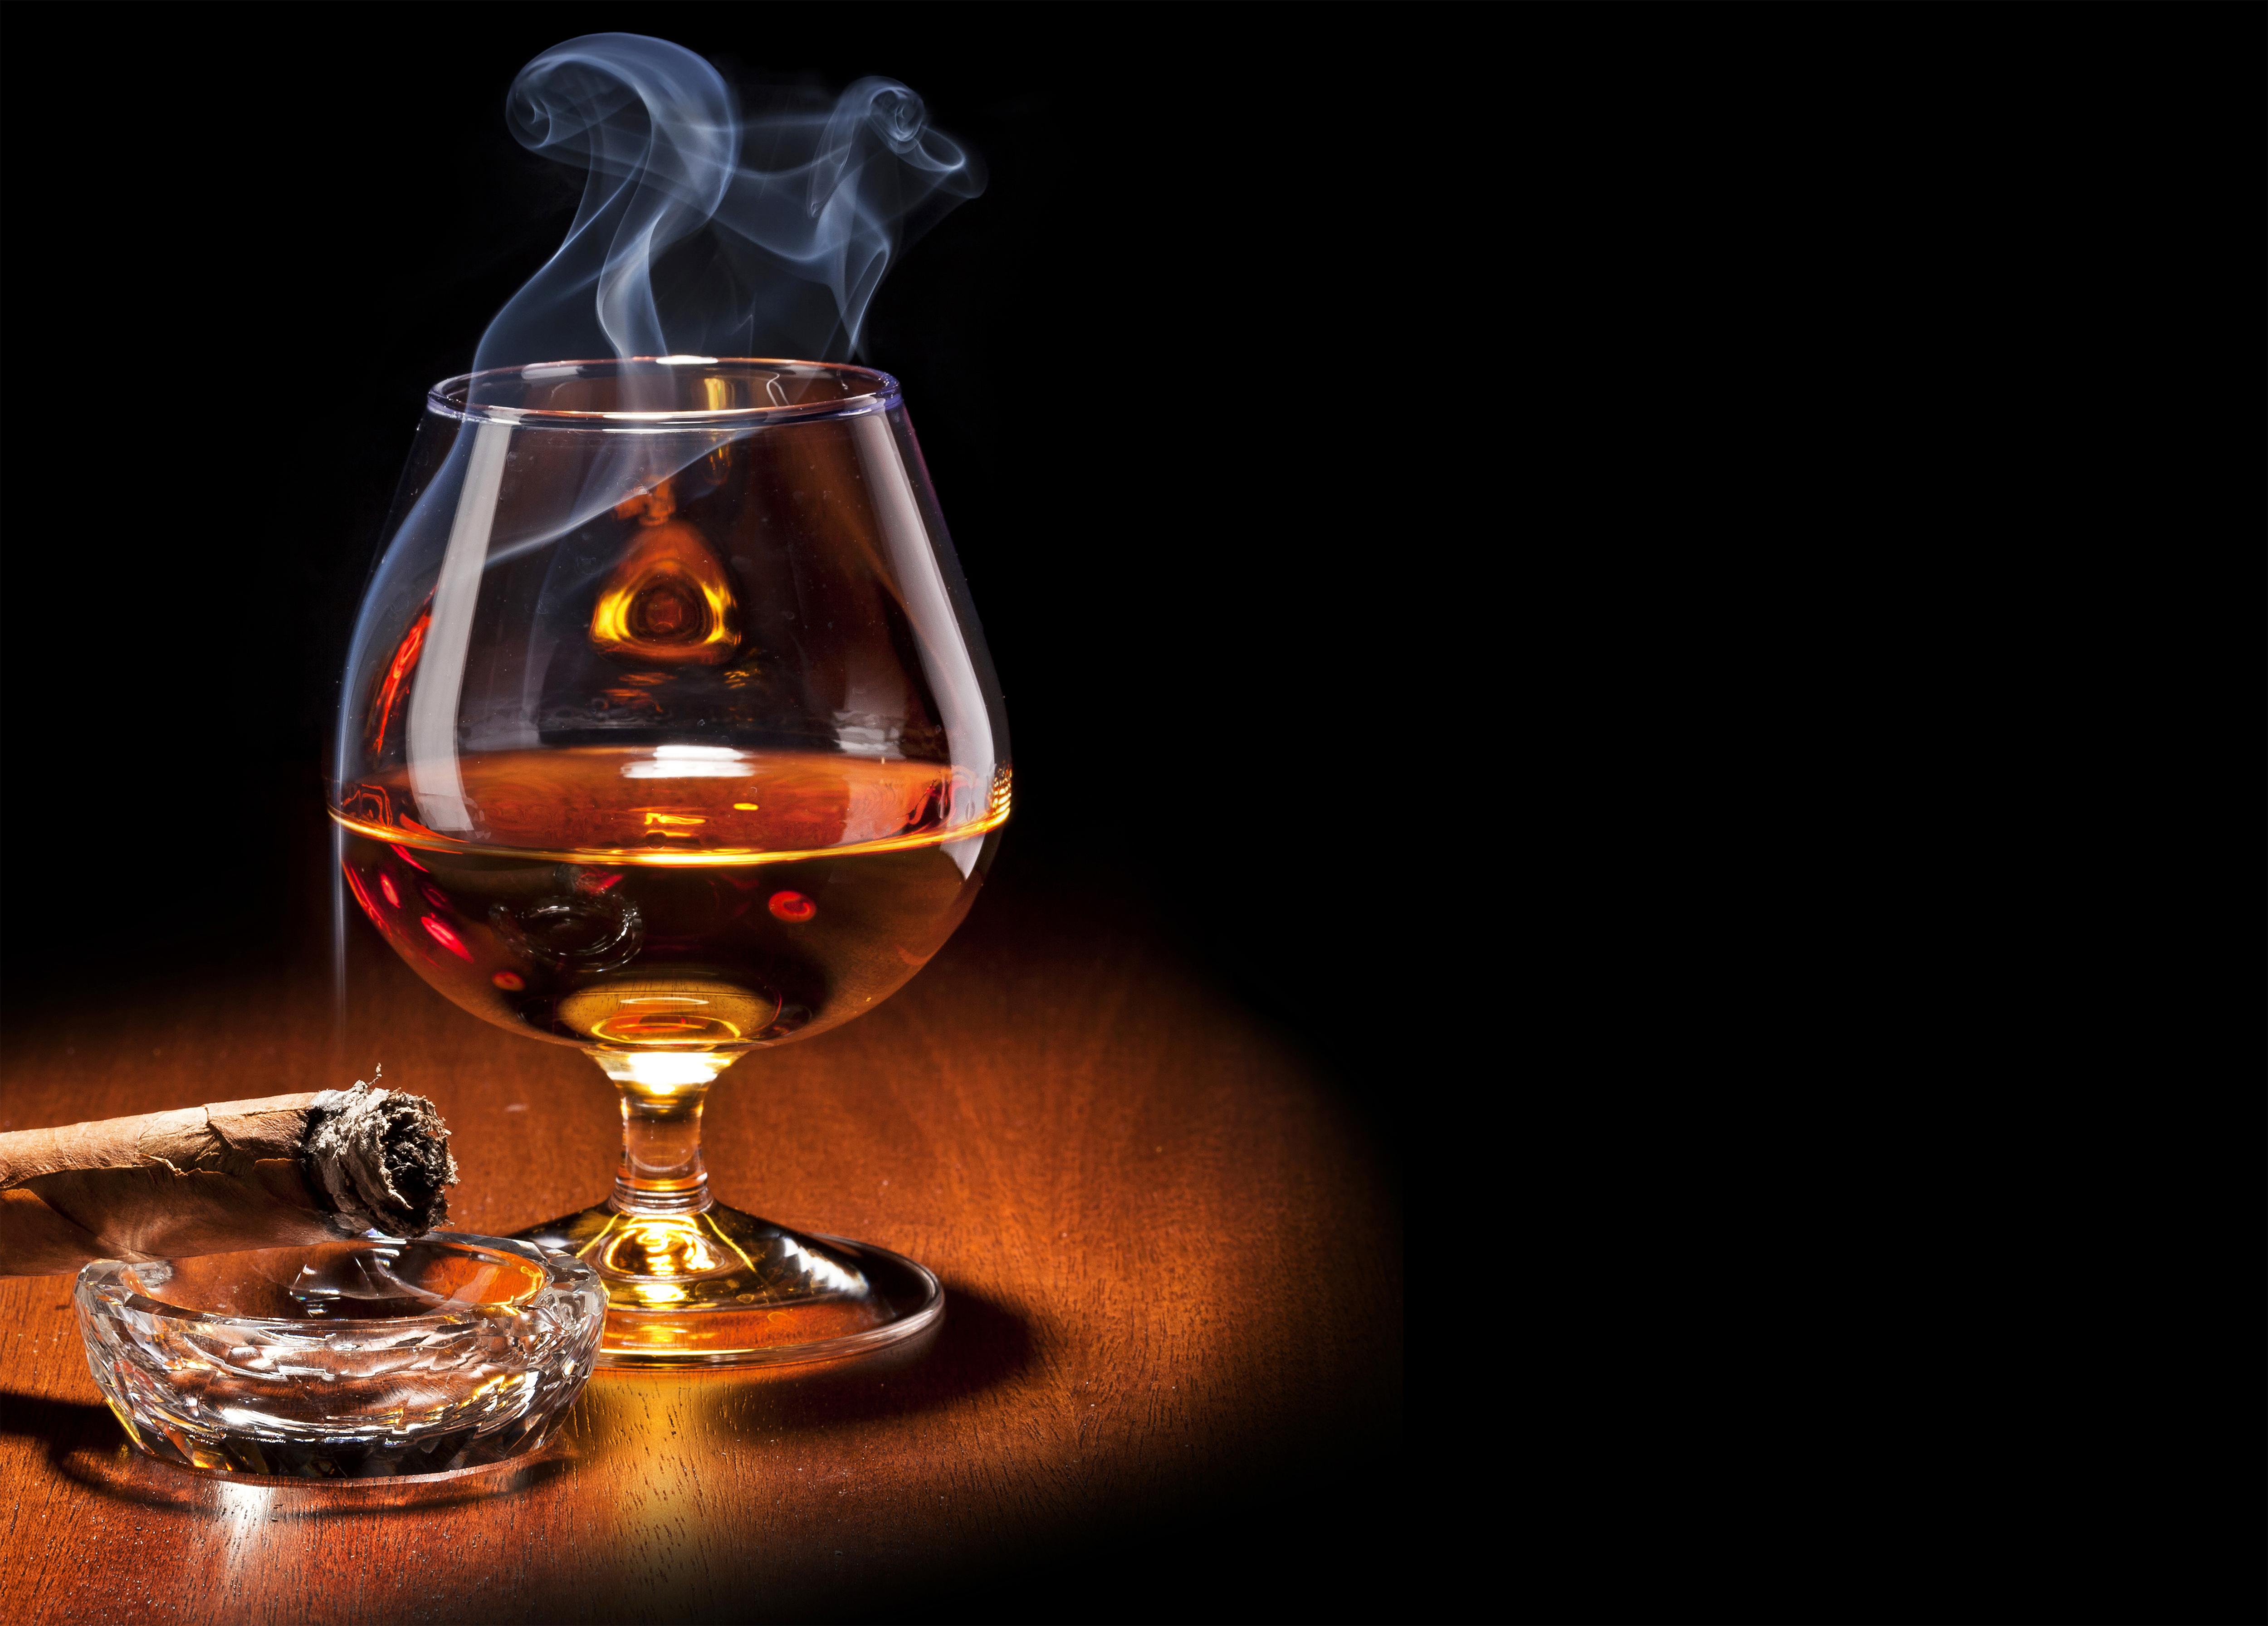 Cigar and Whiskey Wallpaper.